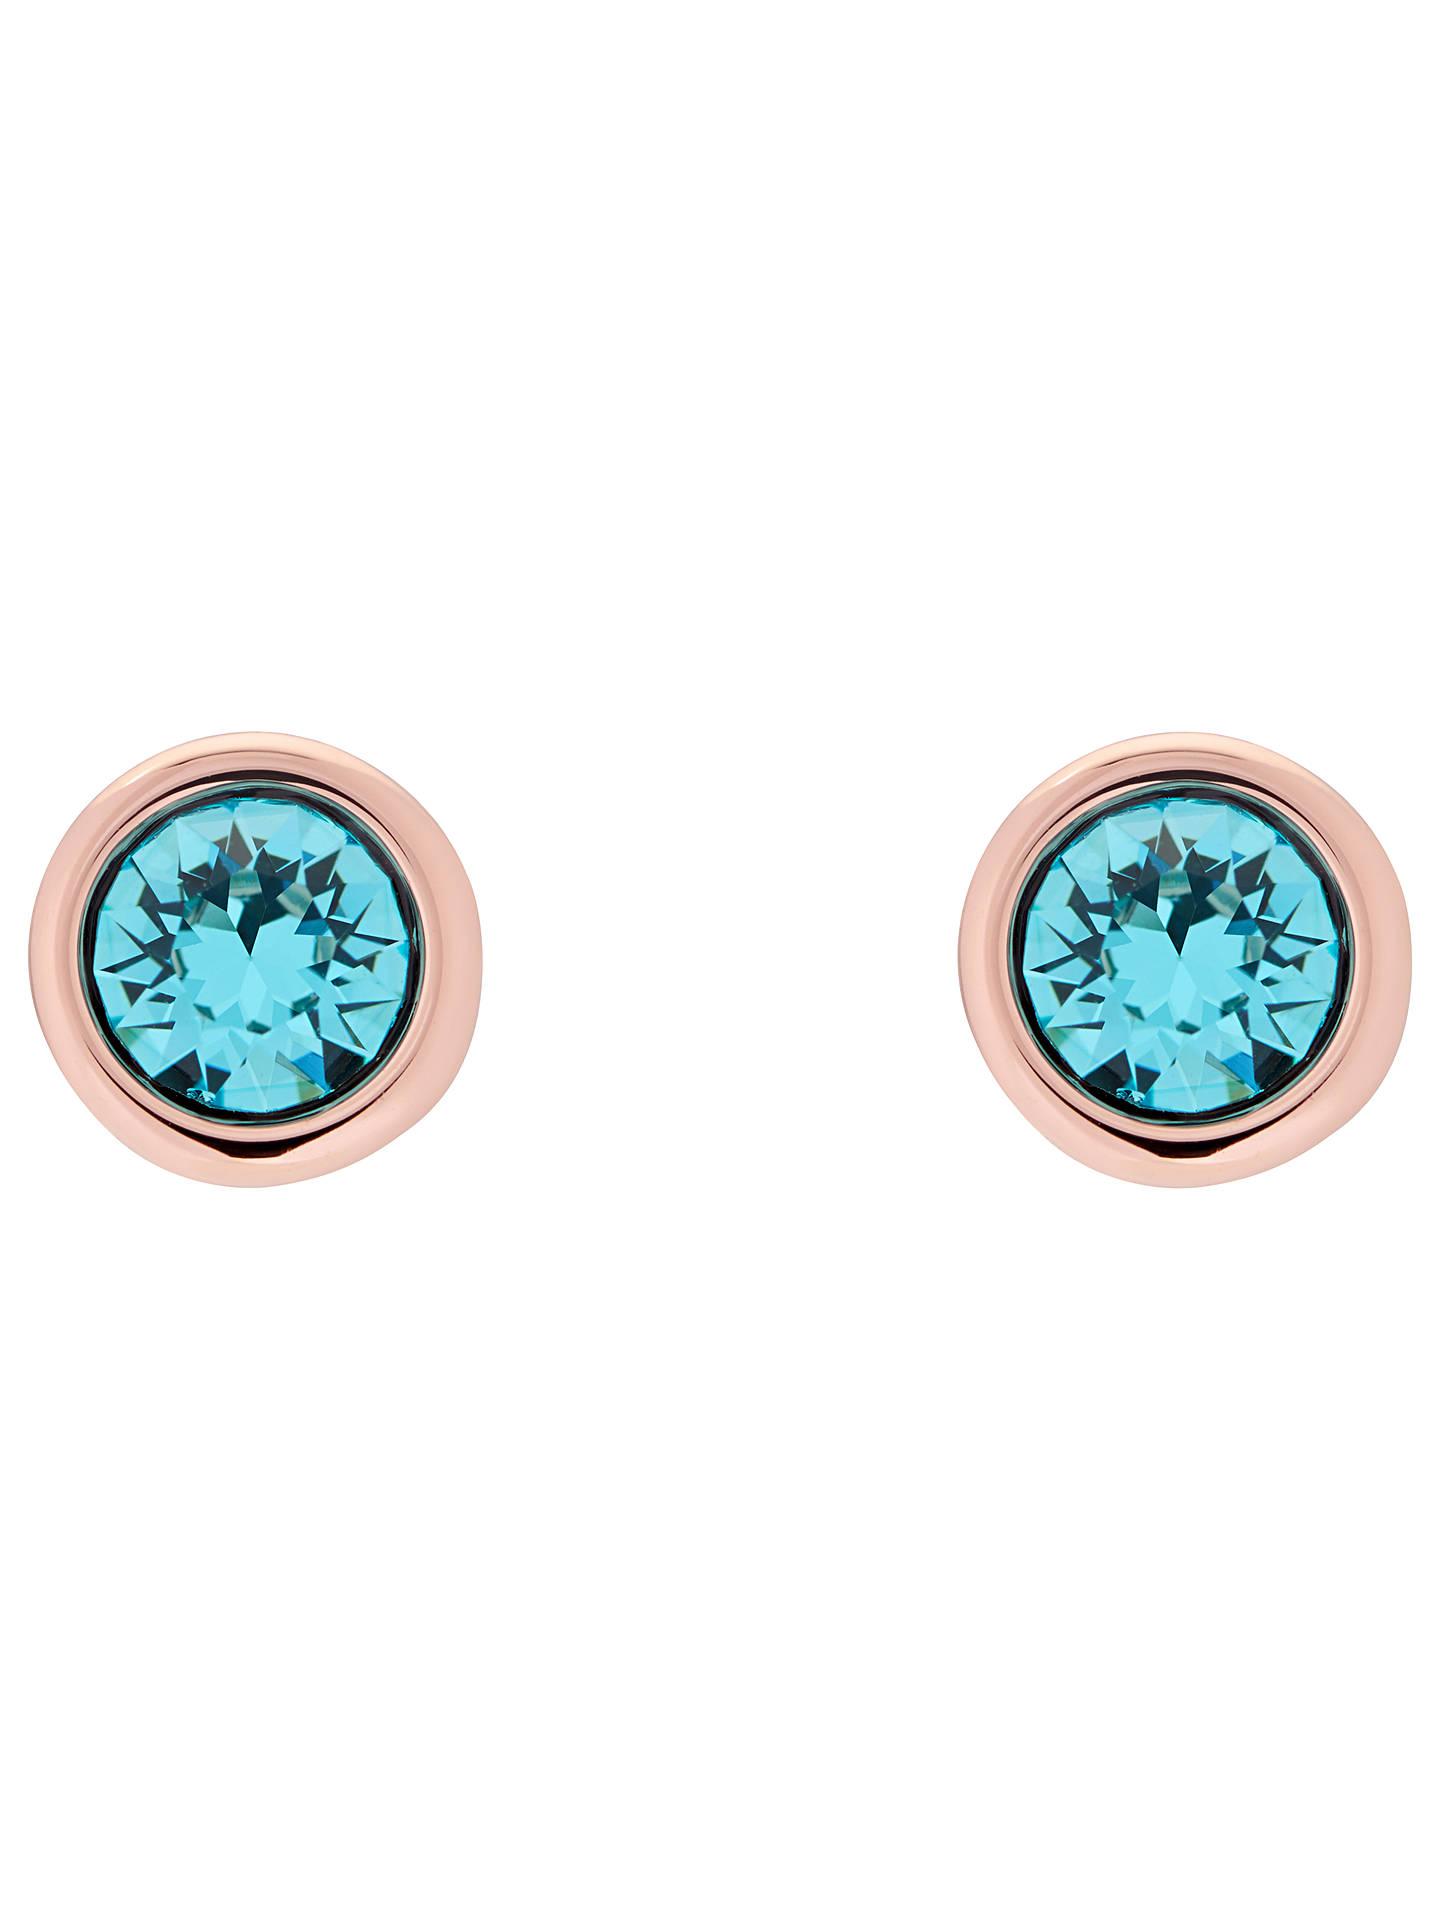 7c84562c7 Buy Ted Baker Sinaa Swarovski Crystal Stud Earrings, Rose Gold/Turquoise  Online at johnlewis ...